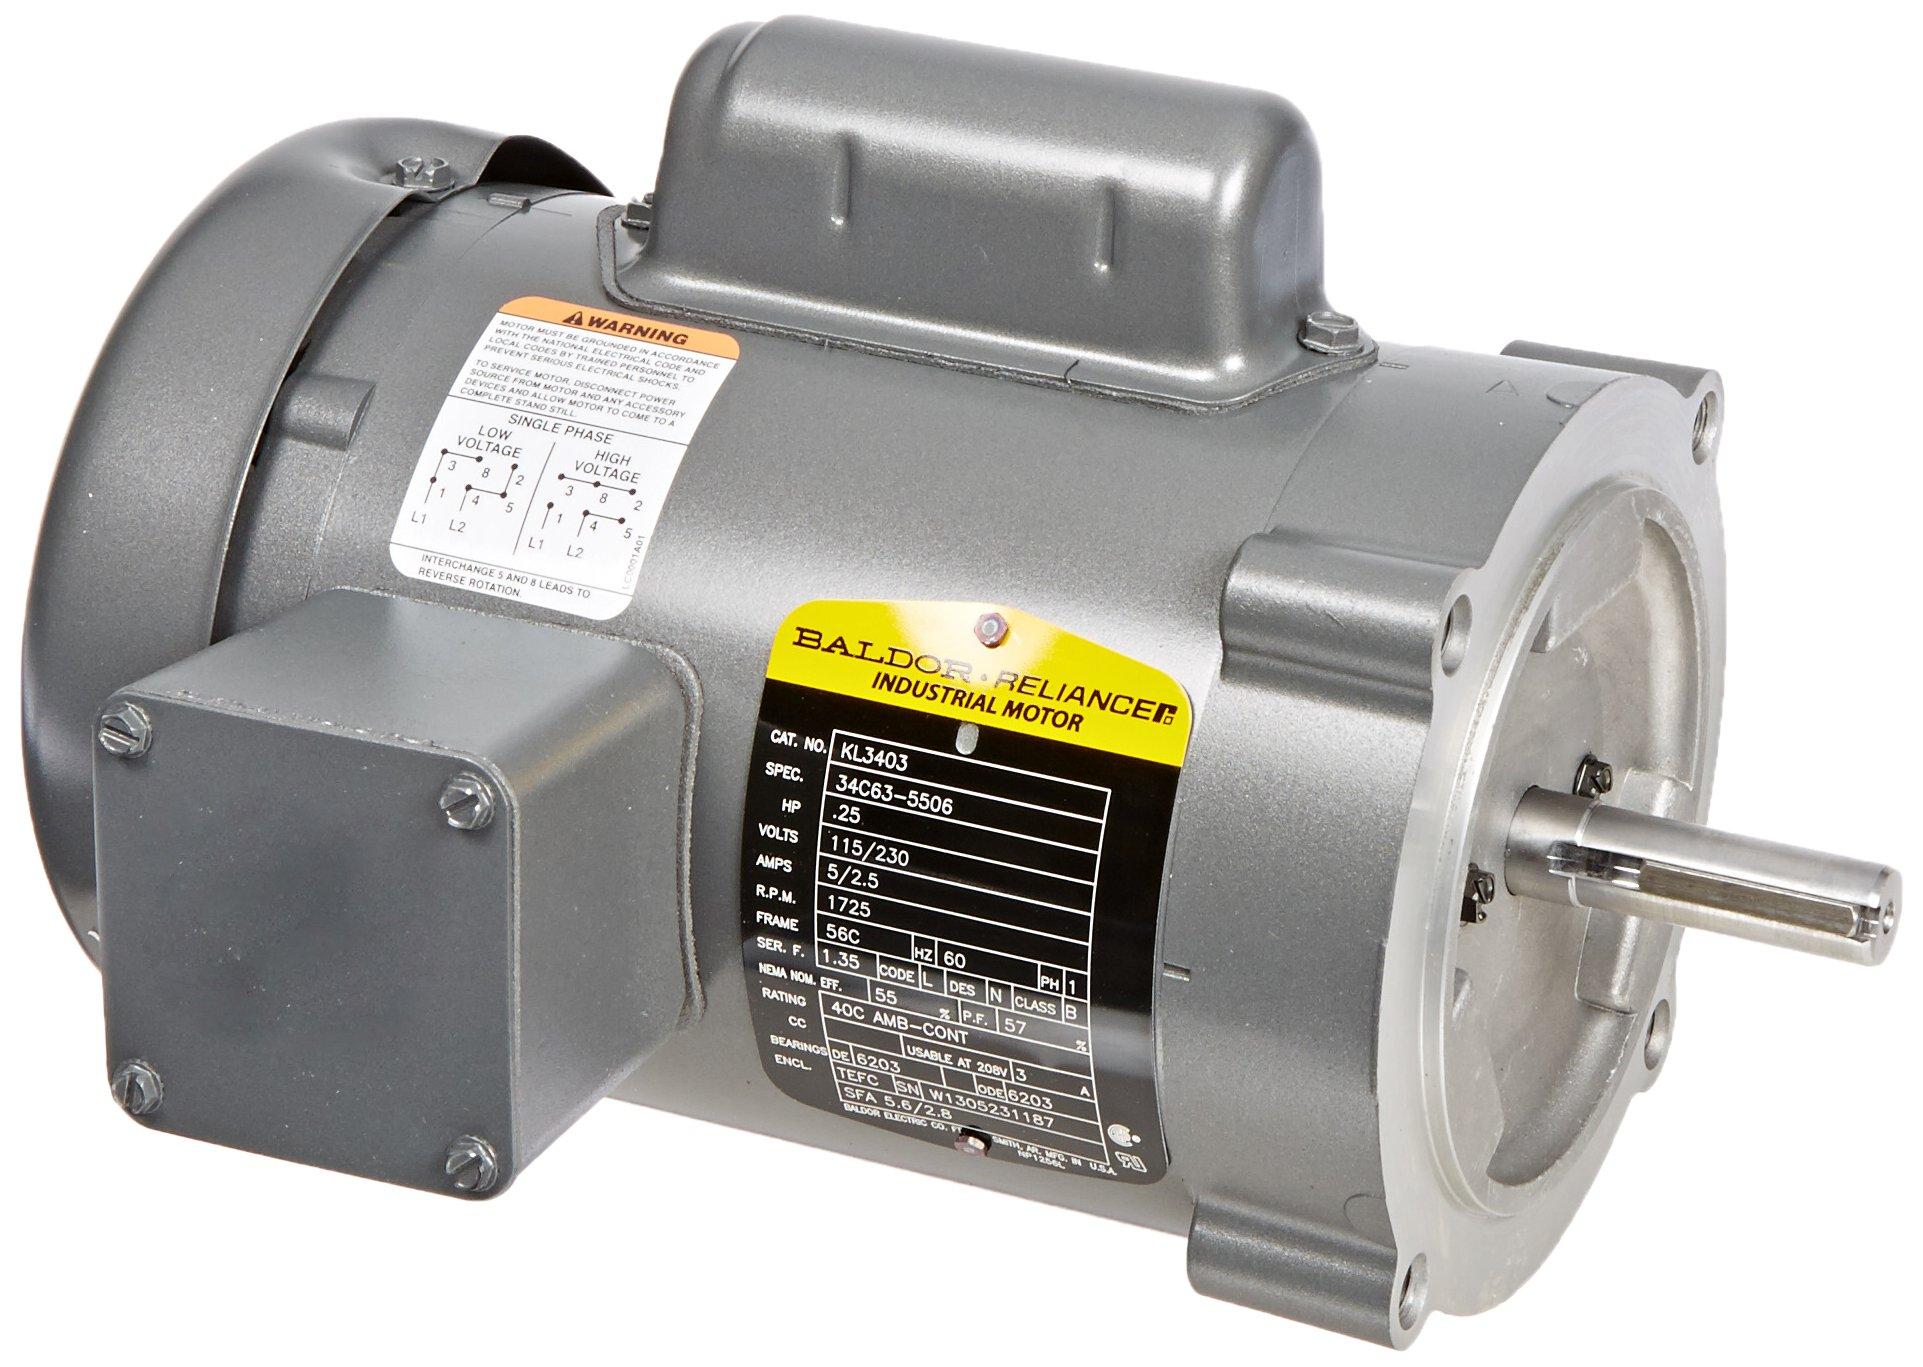 Baldor KL3403 General Purpose AC Motor, Single Phase, 56C Frame, TEFC Enclosure, 1/4Hp Output, 1725rpm, 60Hz, 115/230V Voltage